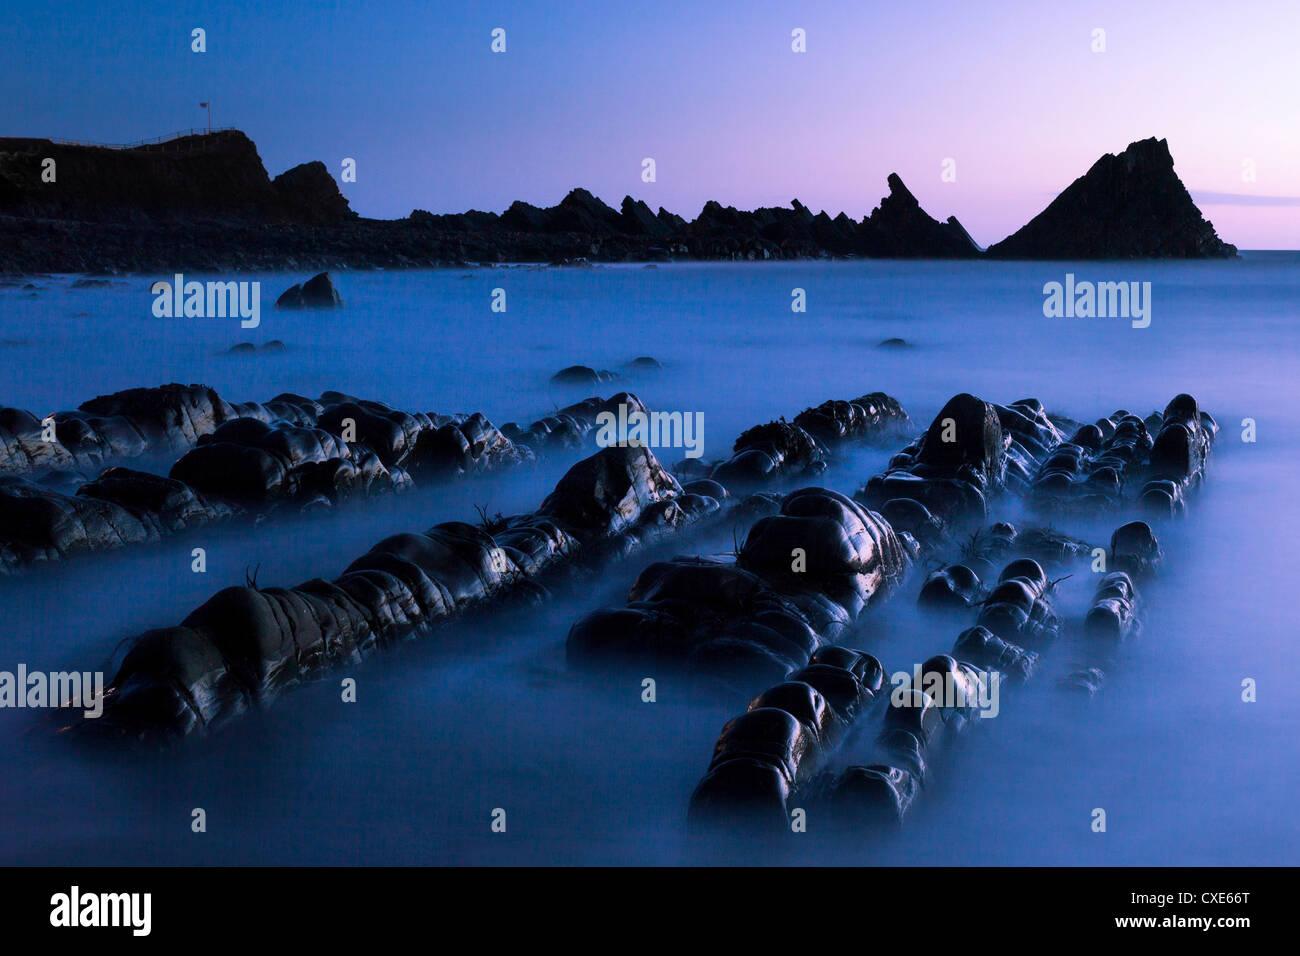 Waves moving over jagged rocks at dusk, on Hartland Quay beach, Cornwall, England, United Kingdom, Europe - Stock Image